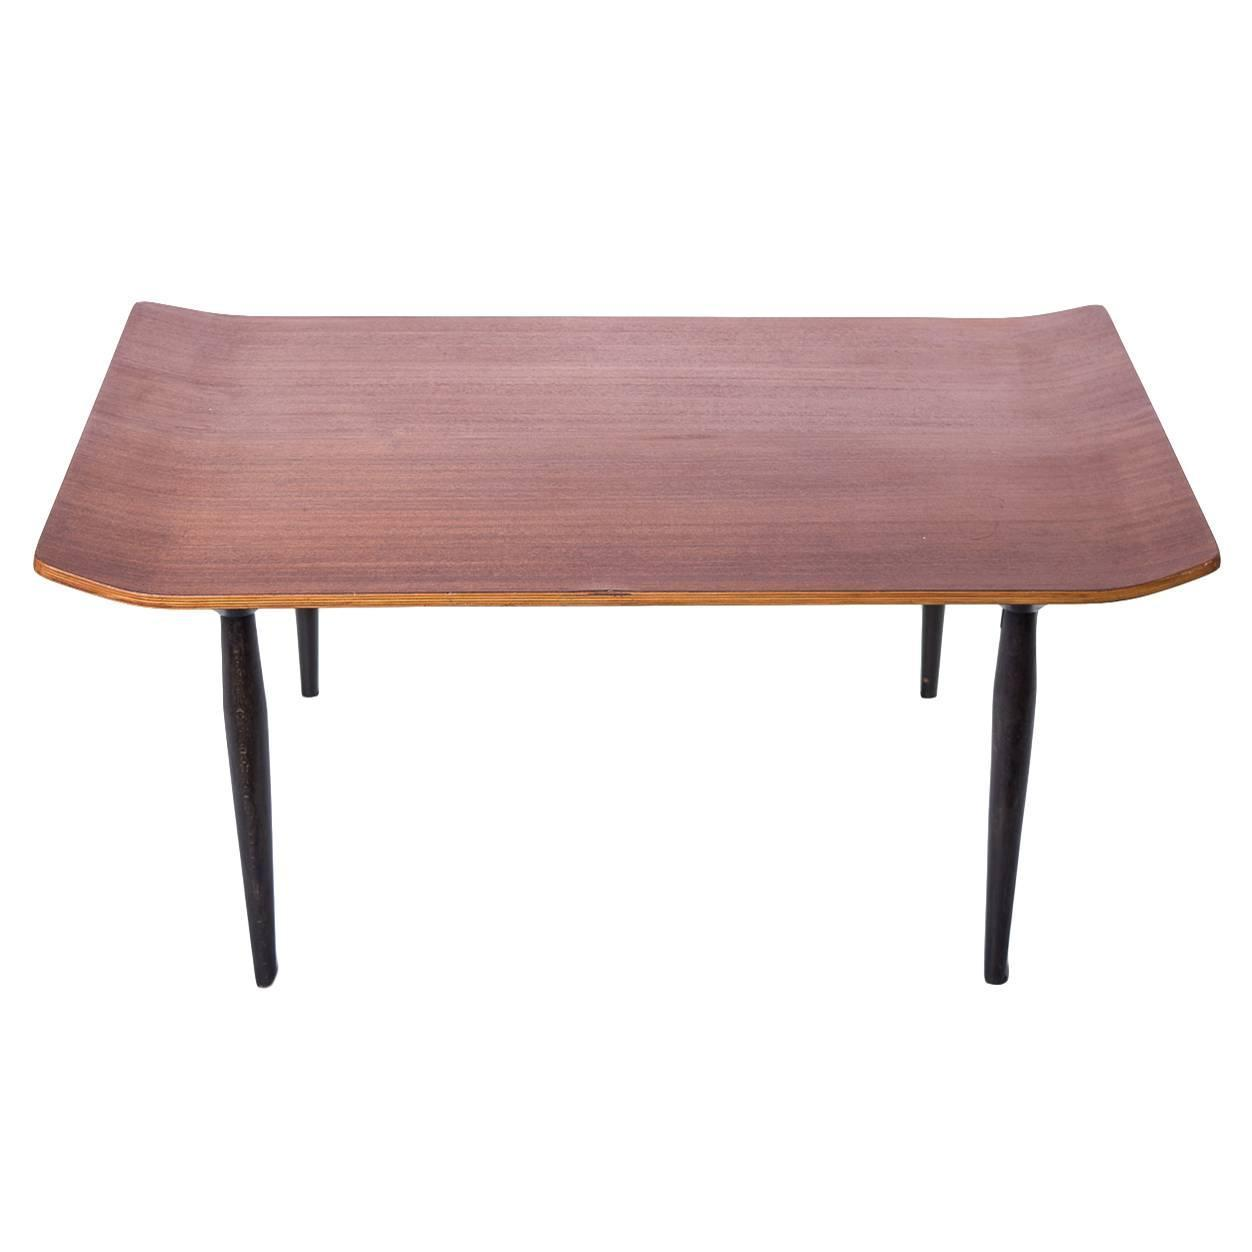 Low table t47 osvaldo borsani tecno at 1stdibs for Cocktail table 47